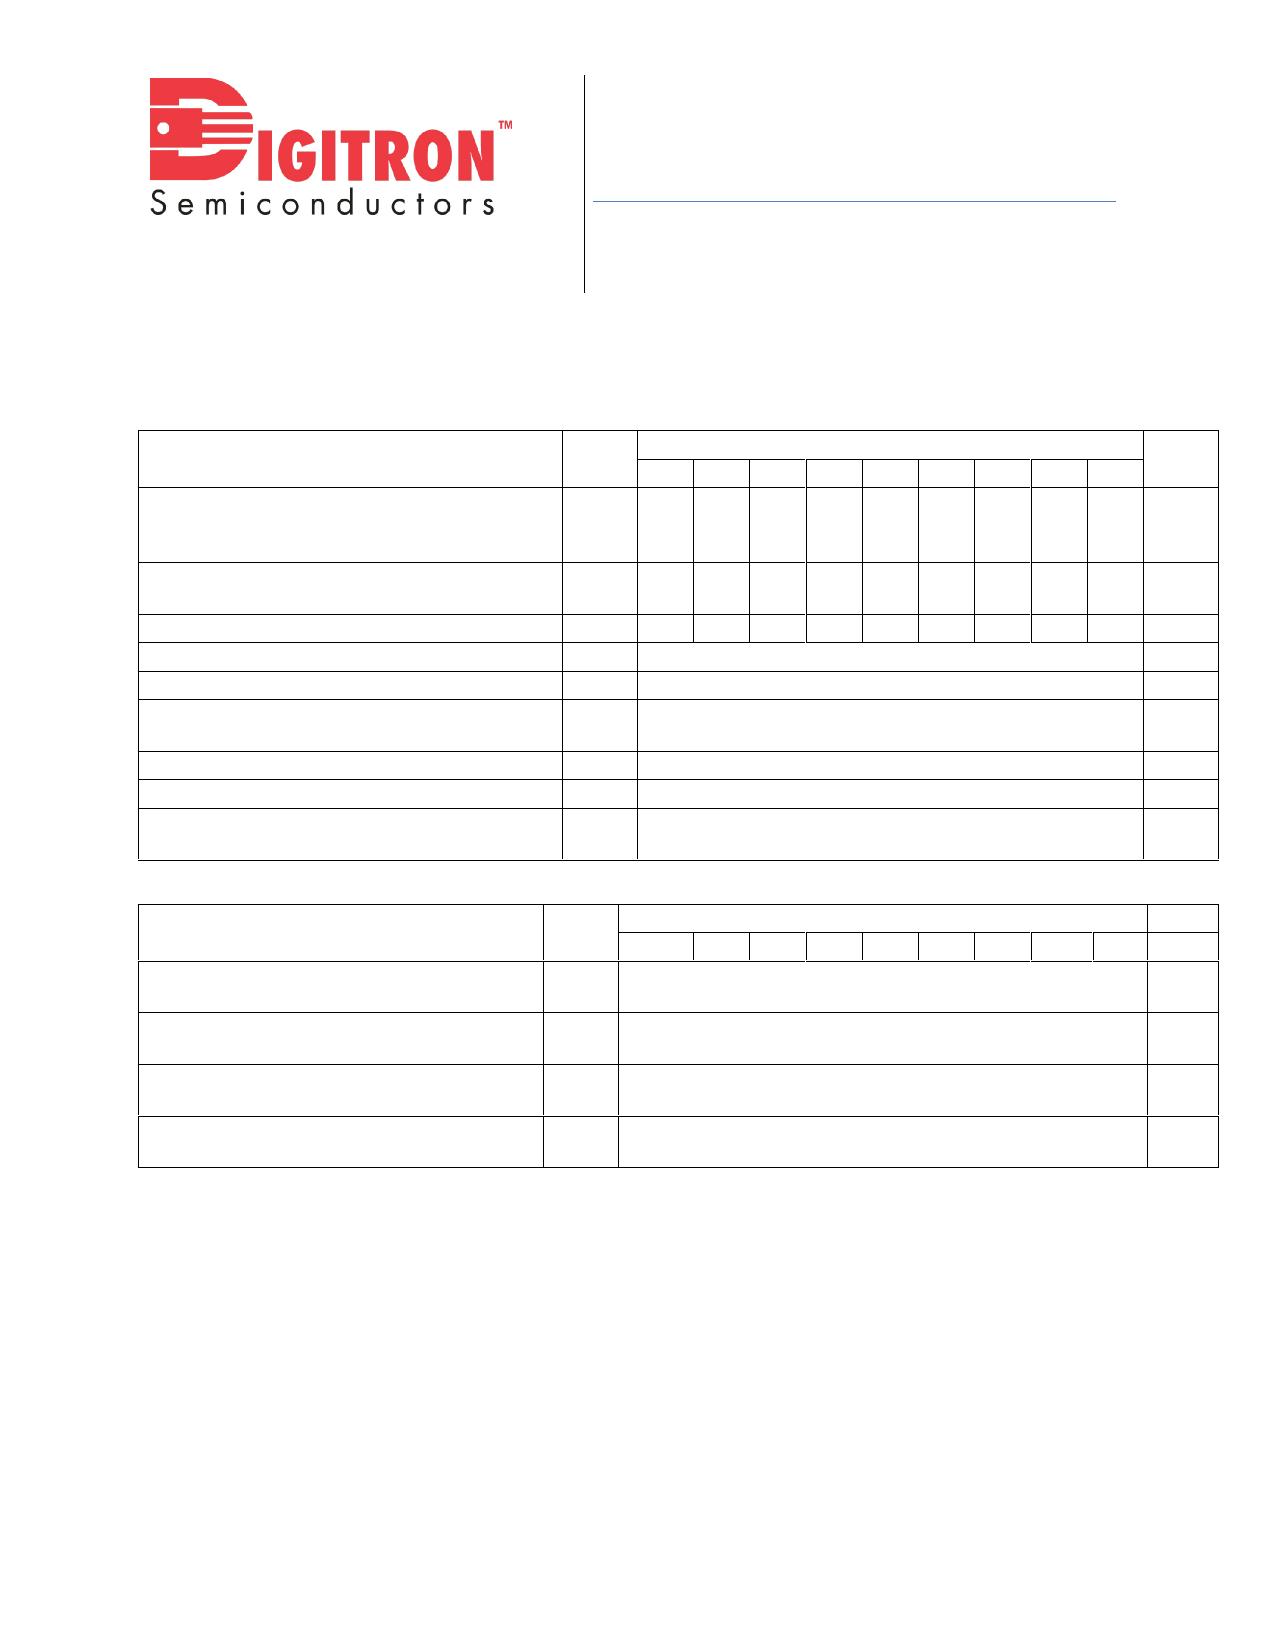 MR1121 데이터시트 및 MR1121 PDF